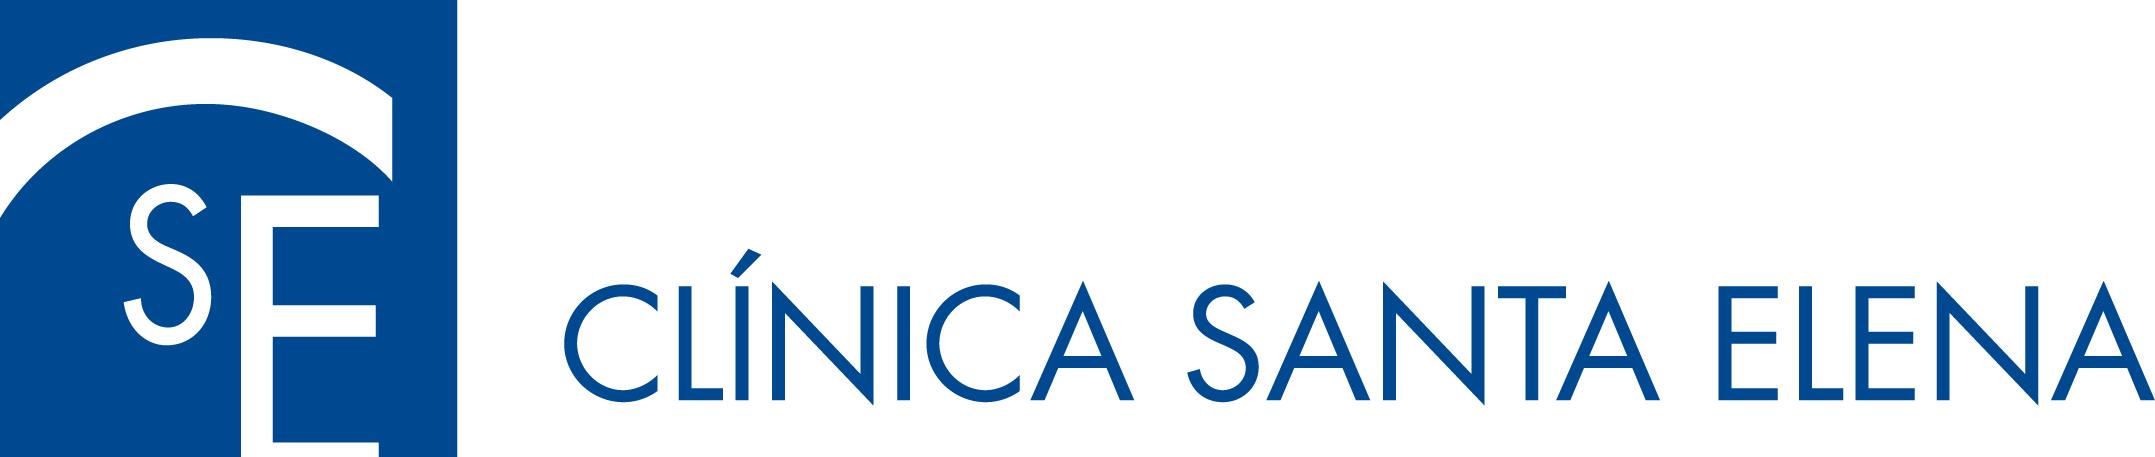 IRSJG_Logo Clinica Santa Elena_300dpi (2)